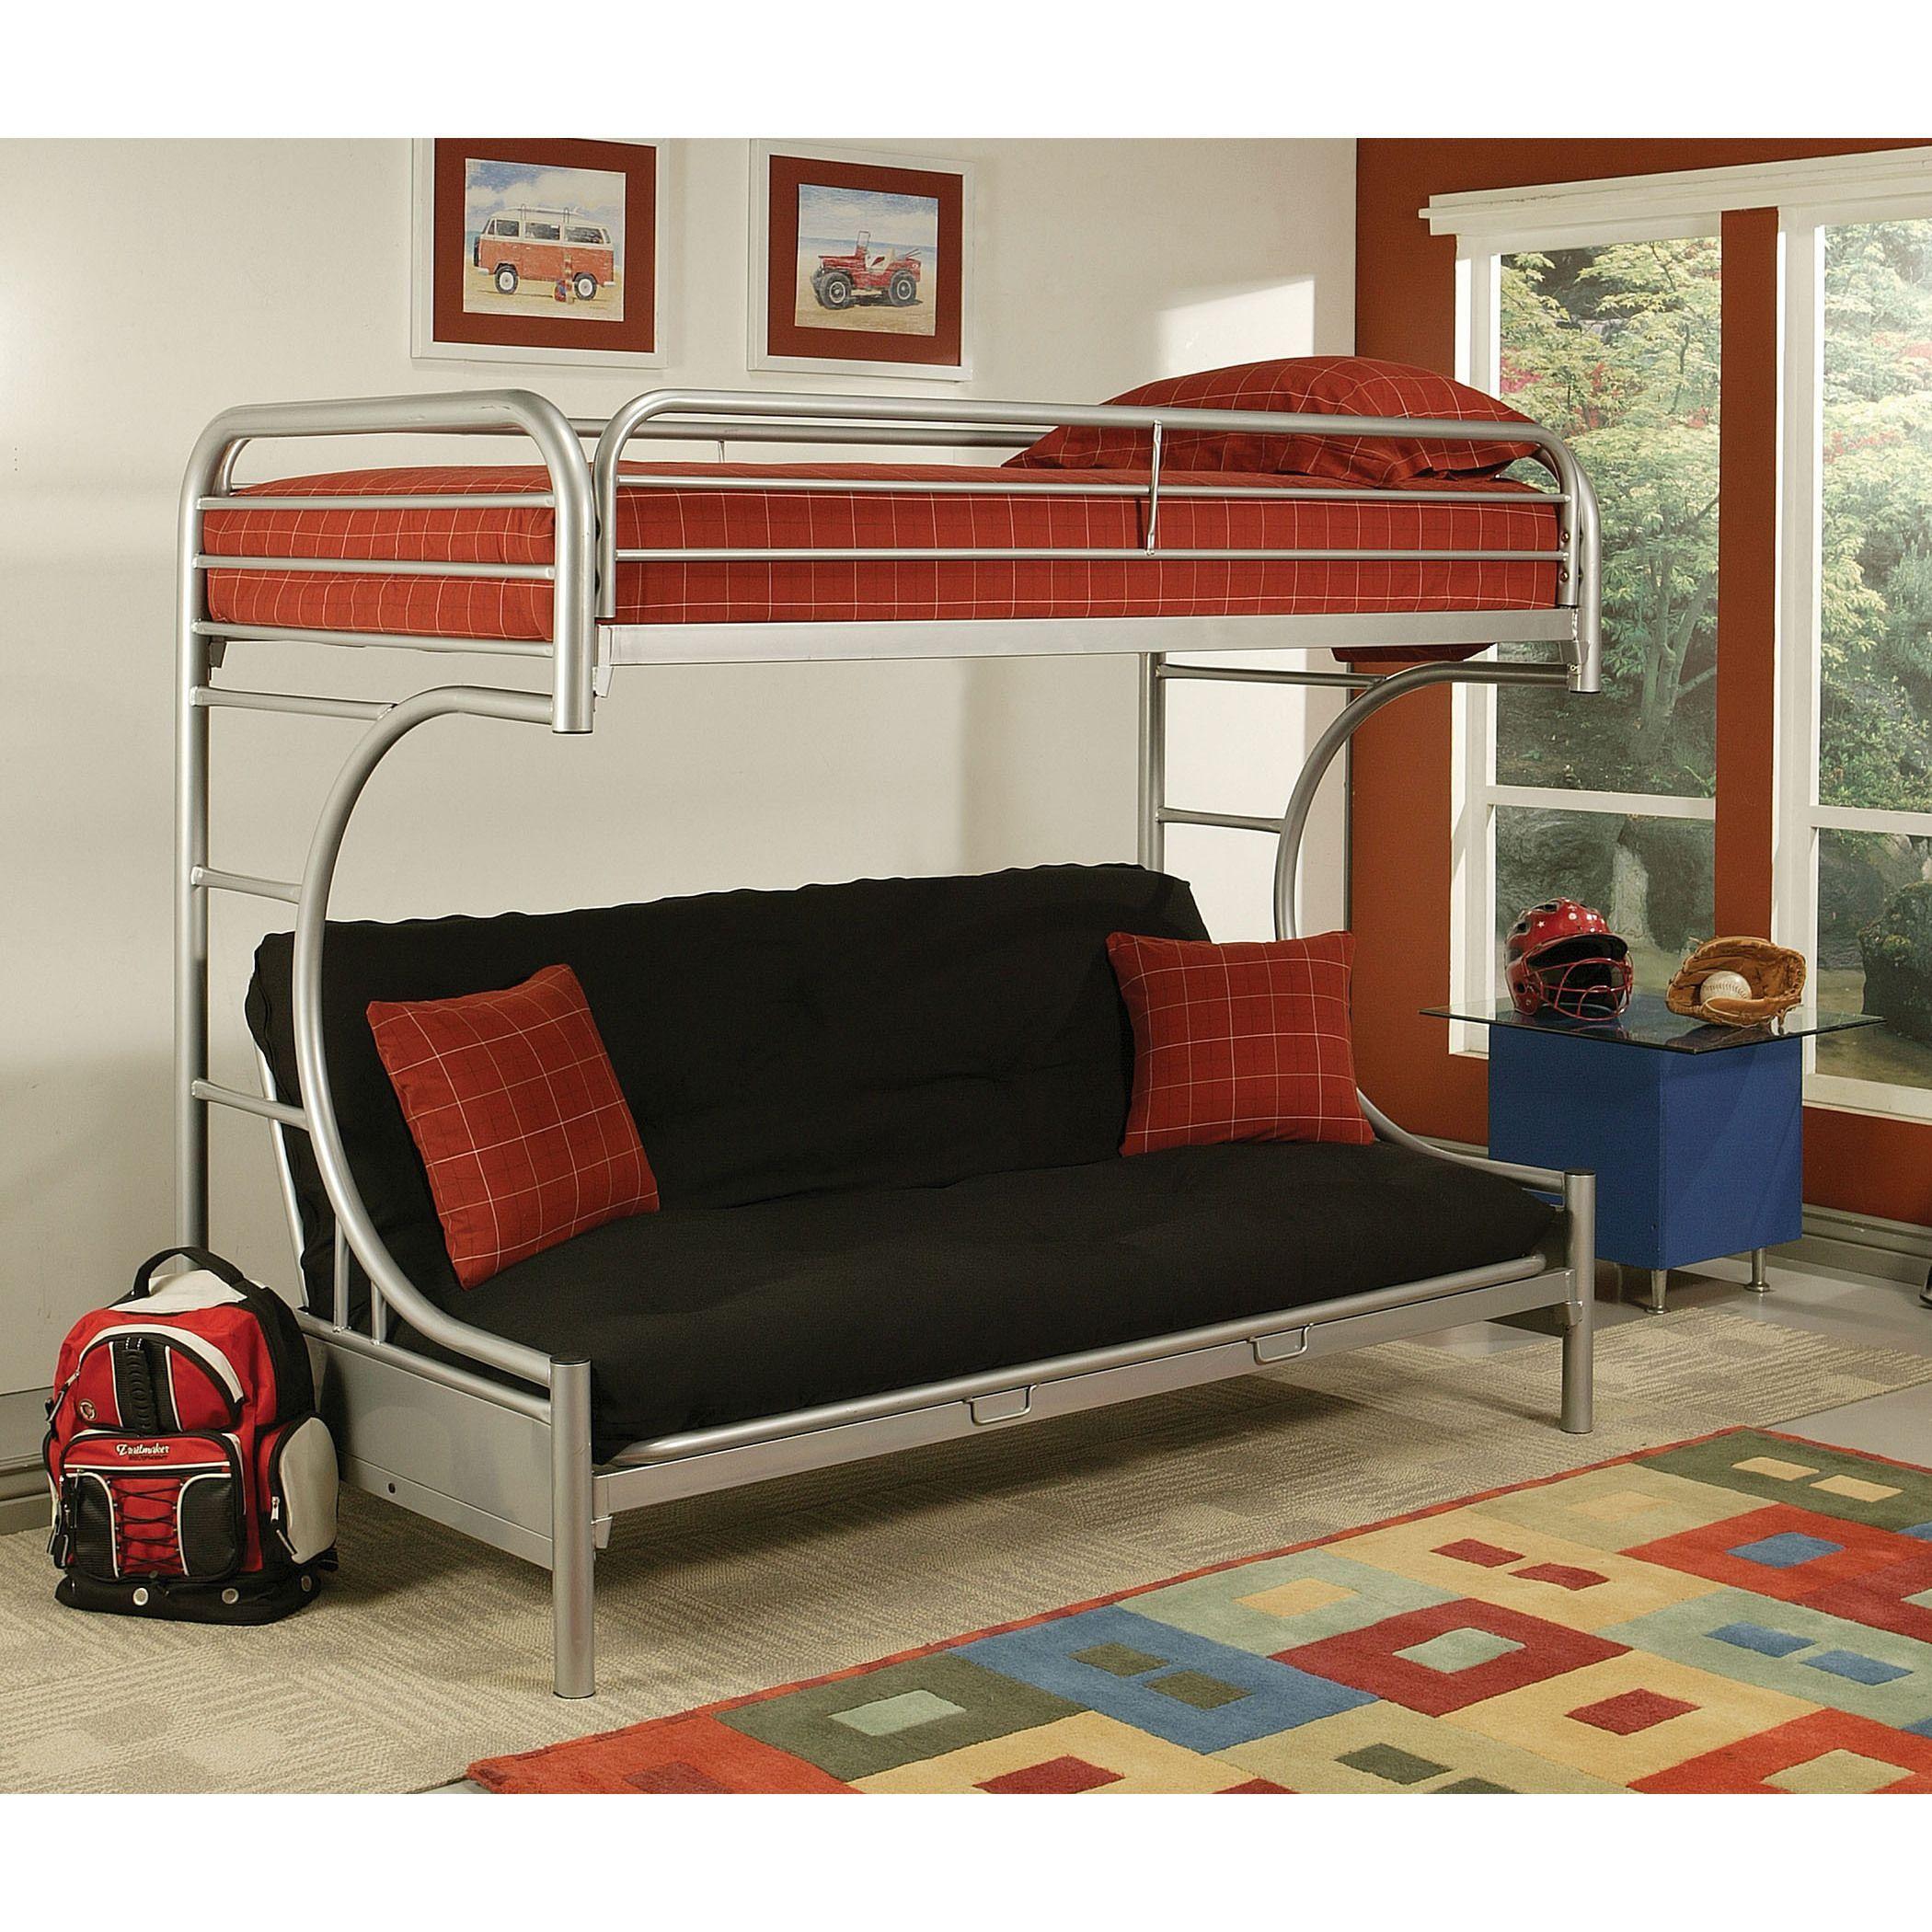 Eclipse Silver Metal Twin Xl Queen Futon Bunk Bed 84l X 62 W 65 H